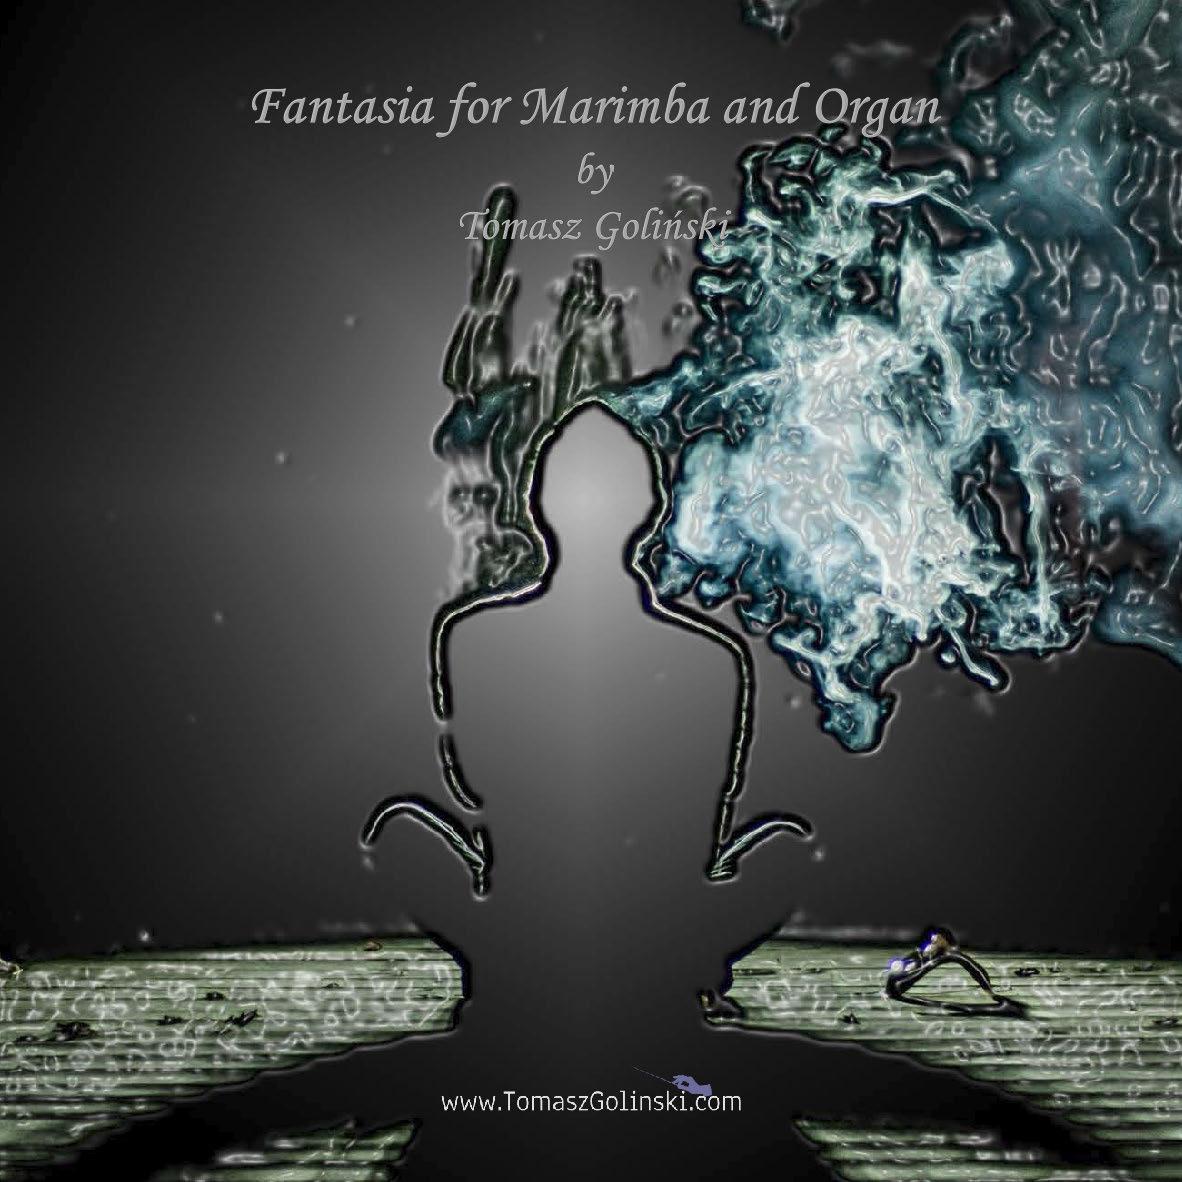 Fantasia for Marimba and Organ